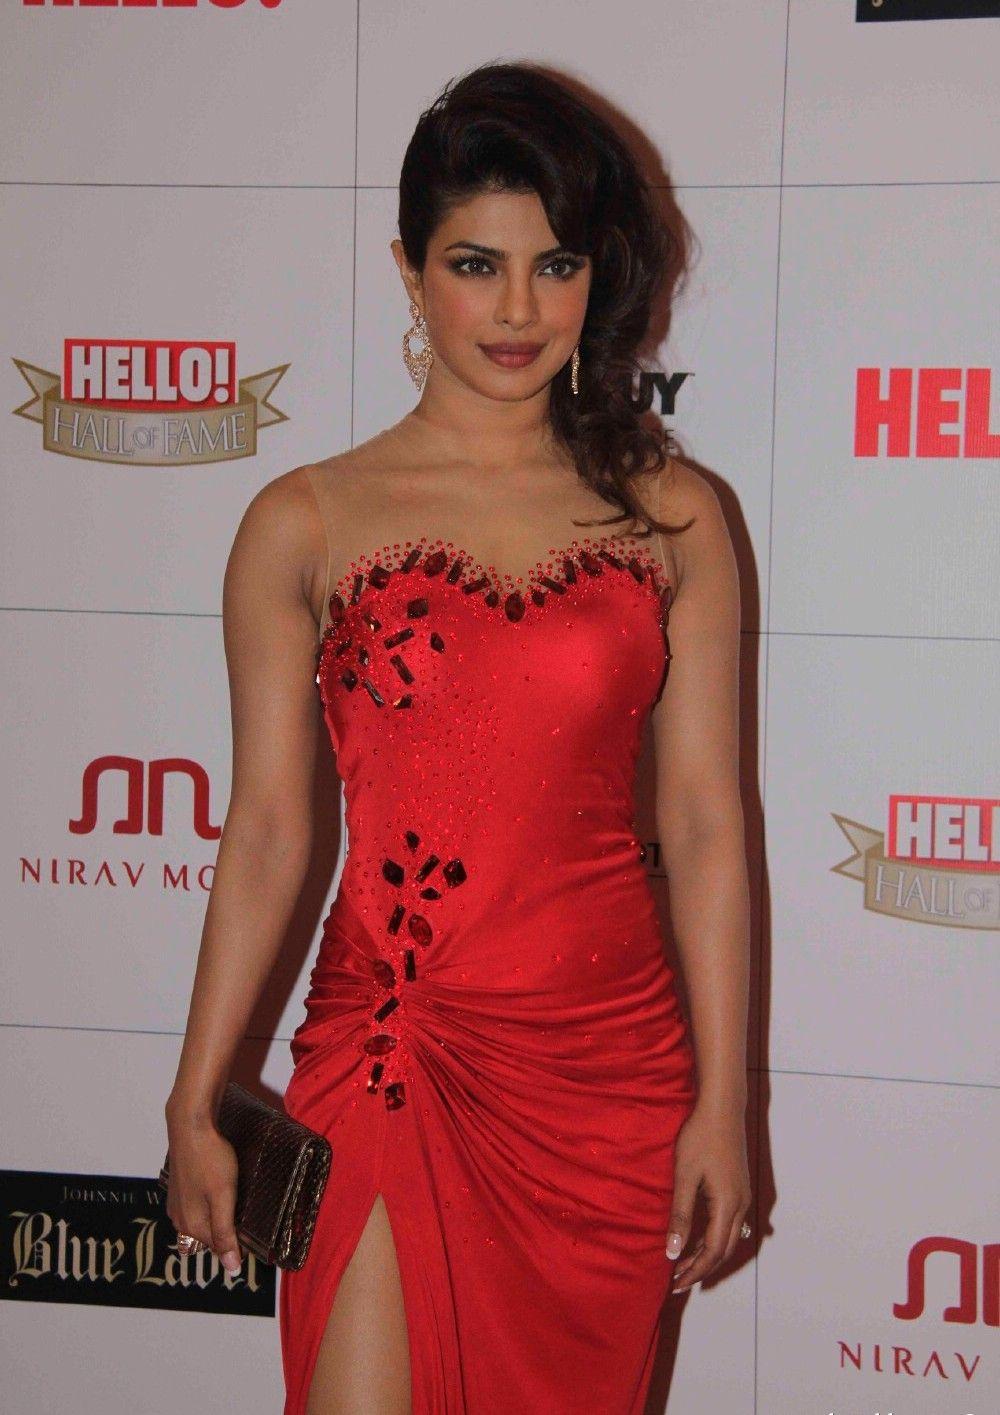 Priyanka Chopra At Hello Awards 2013 stills